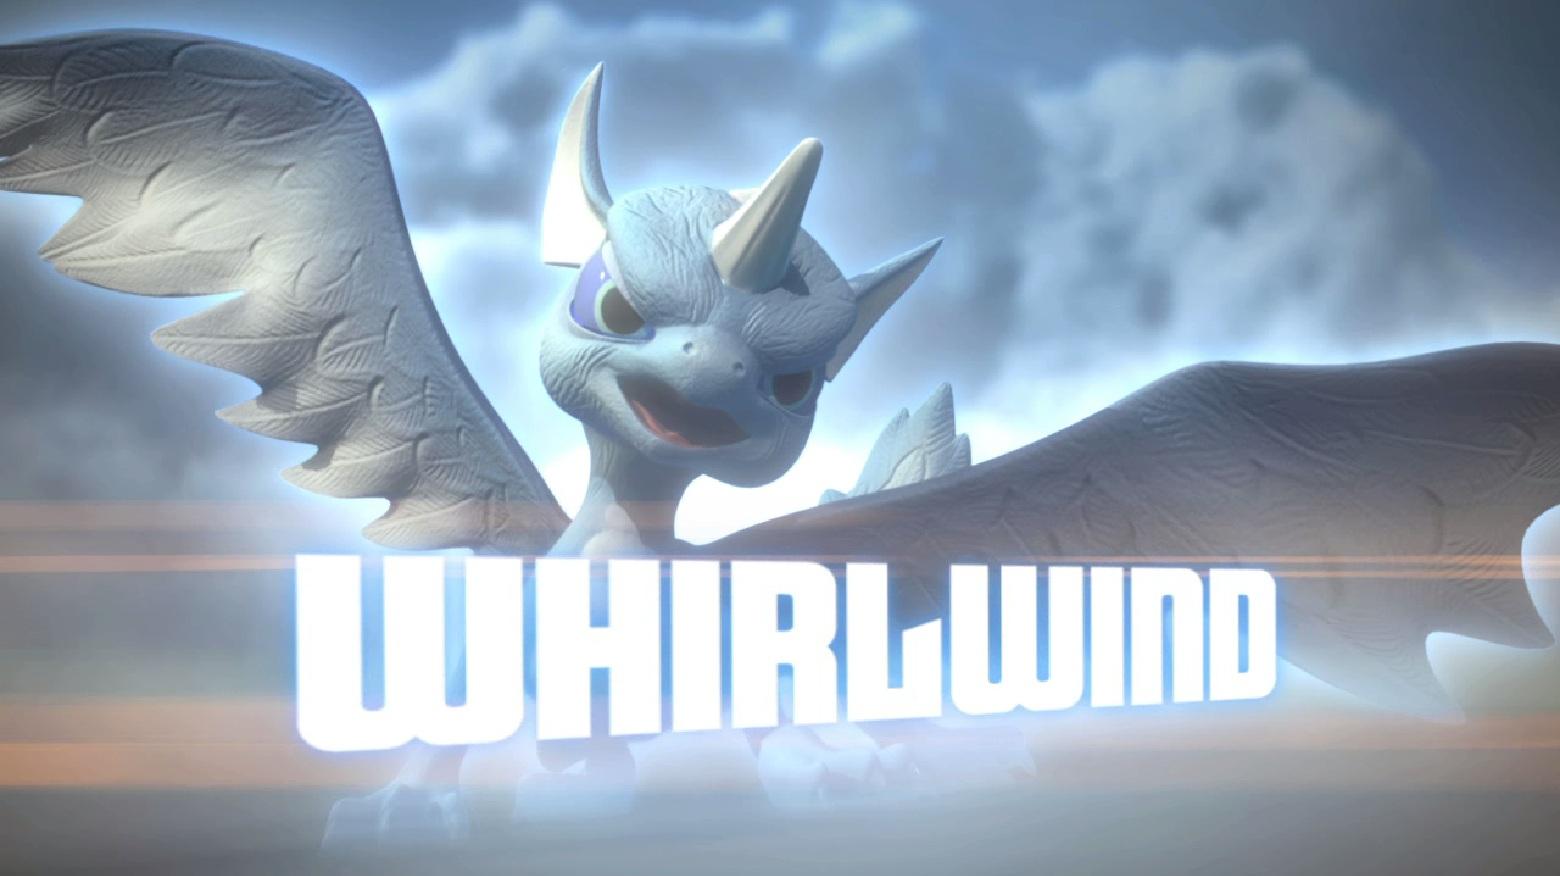 Datei:Whirlwind Trailer.jpg